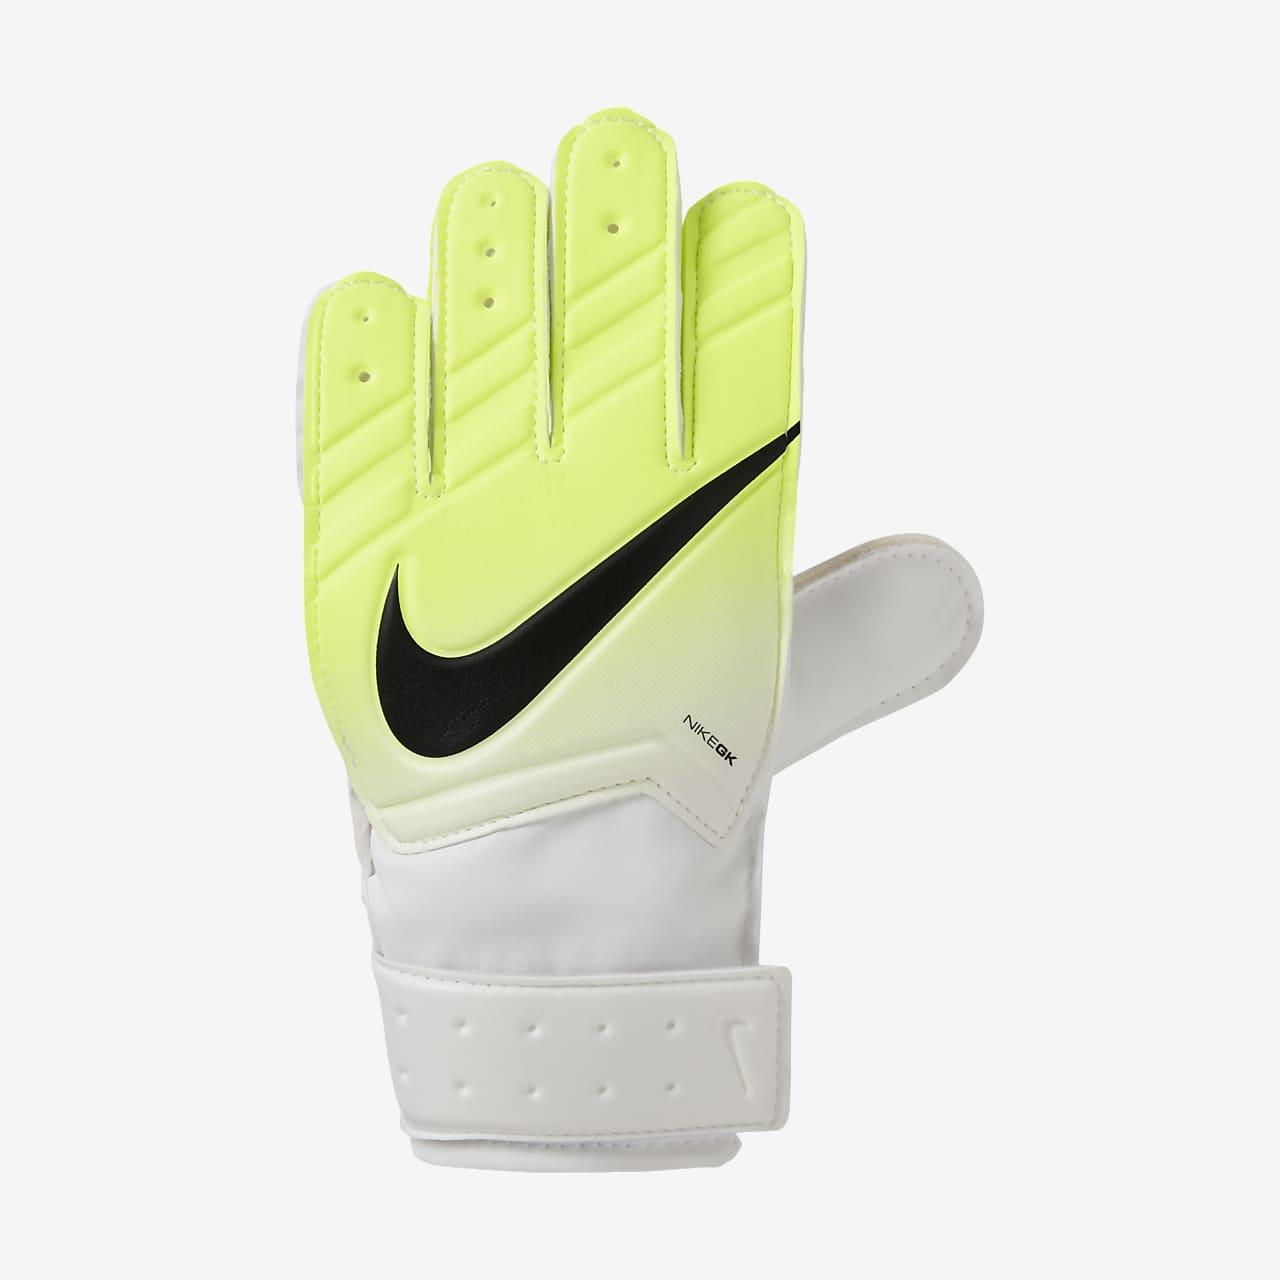 Nike Junior Match Goalkeeper Older Kids' Football Gloves